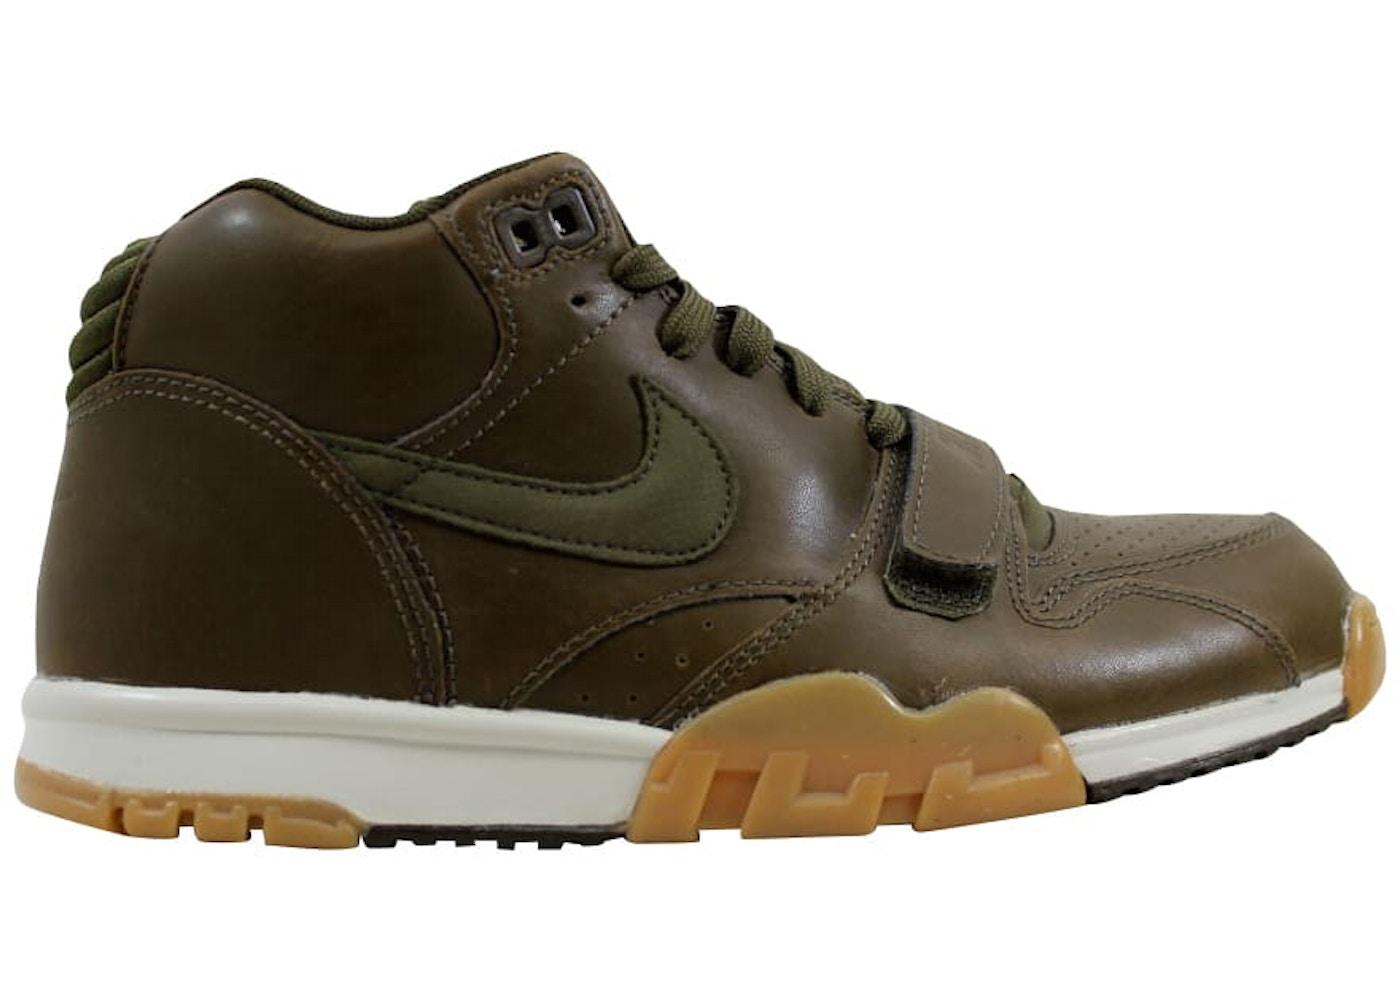 55cb02158de Nike Air Trainer 1 Mid Olive - 317554-300